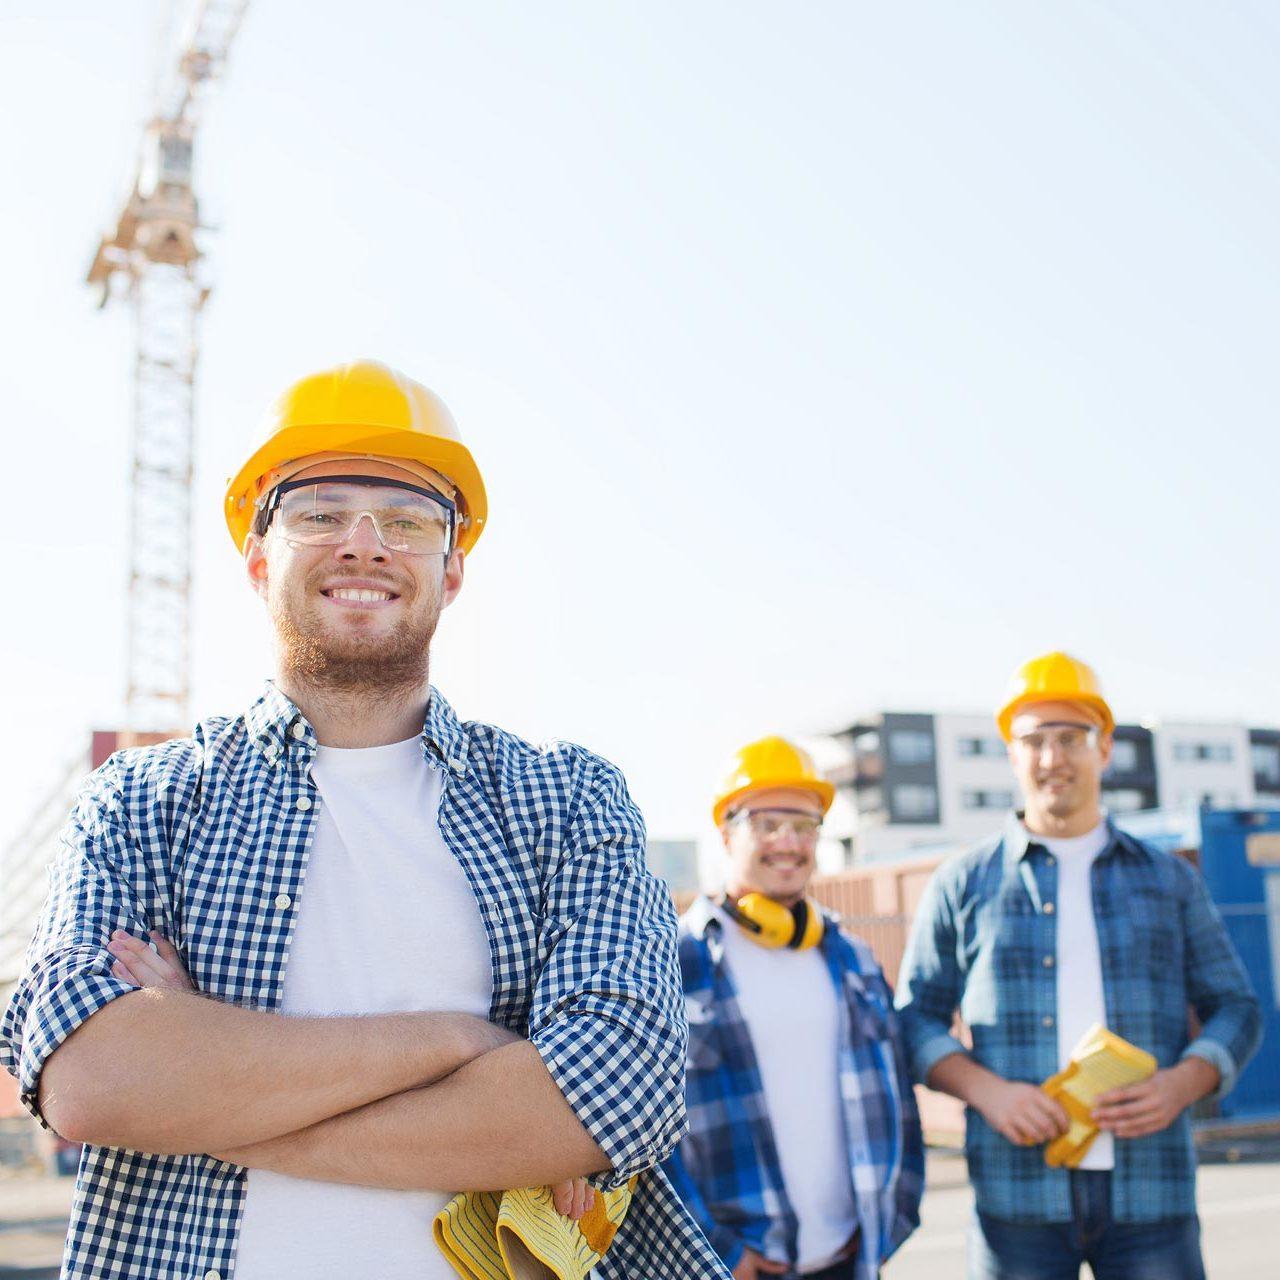 career construction club brings - HD1280×1280